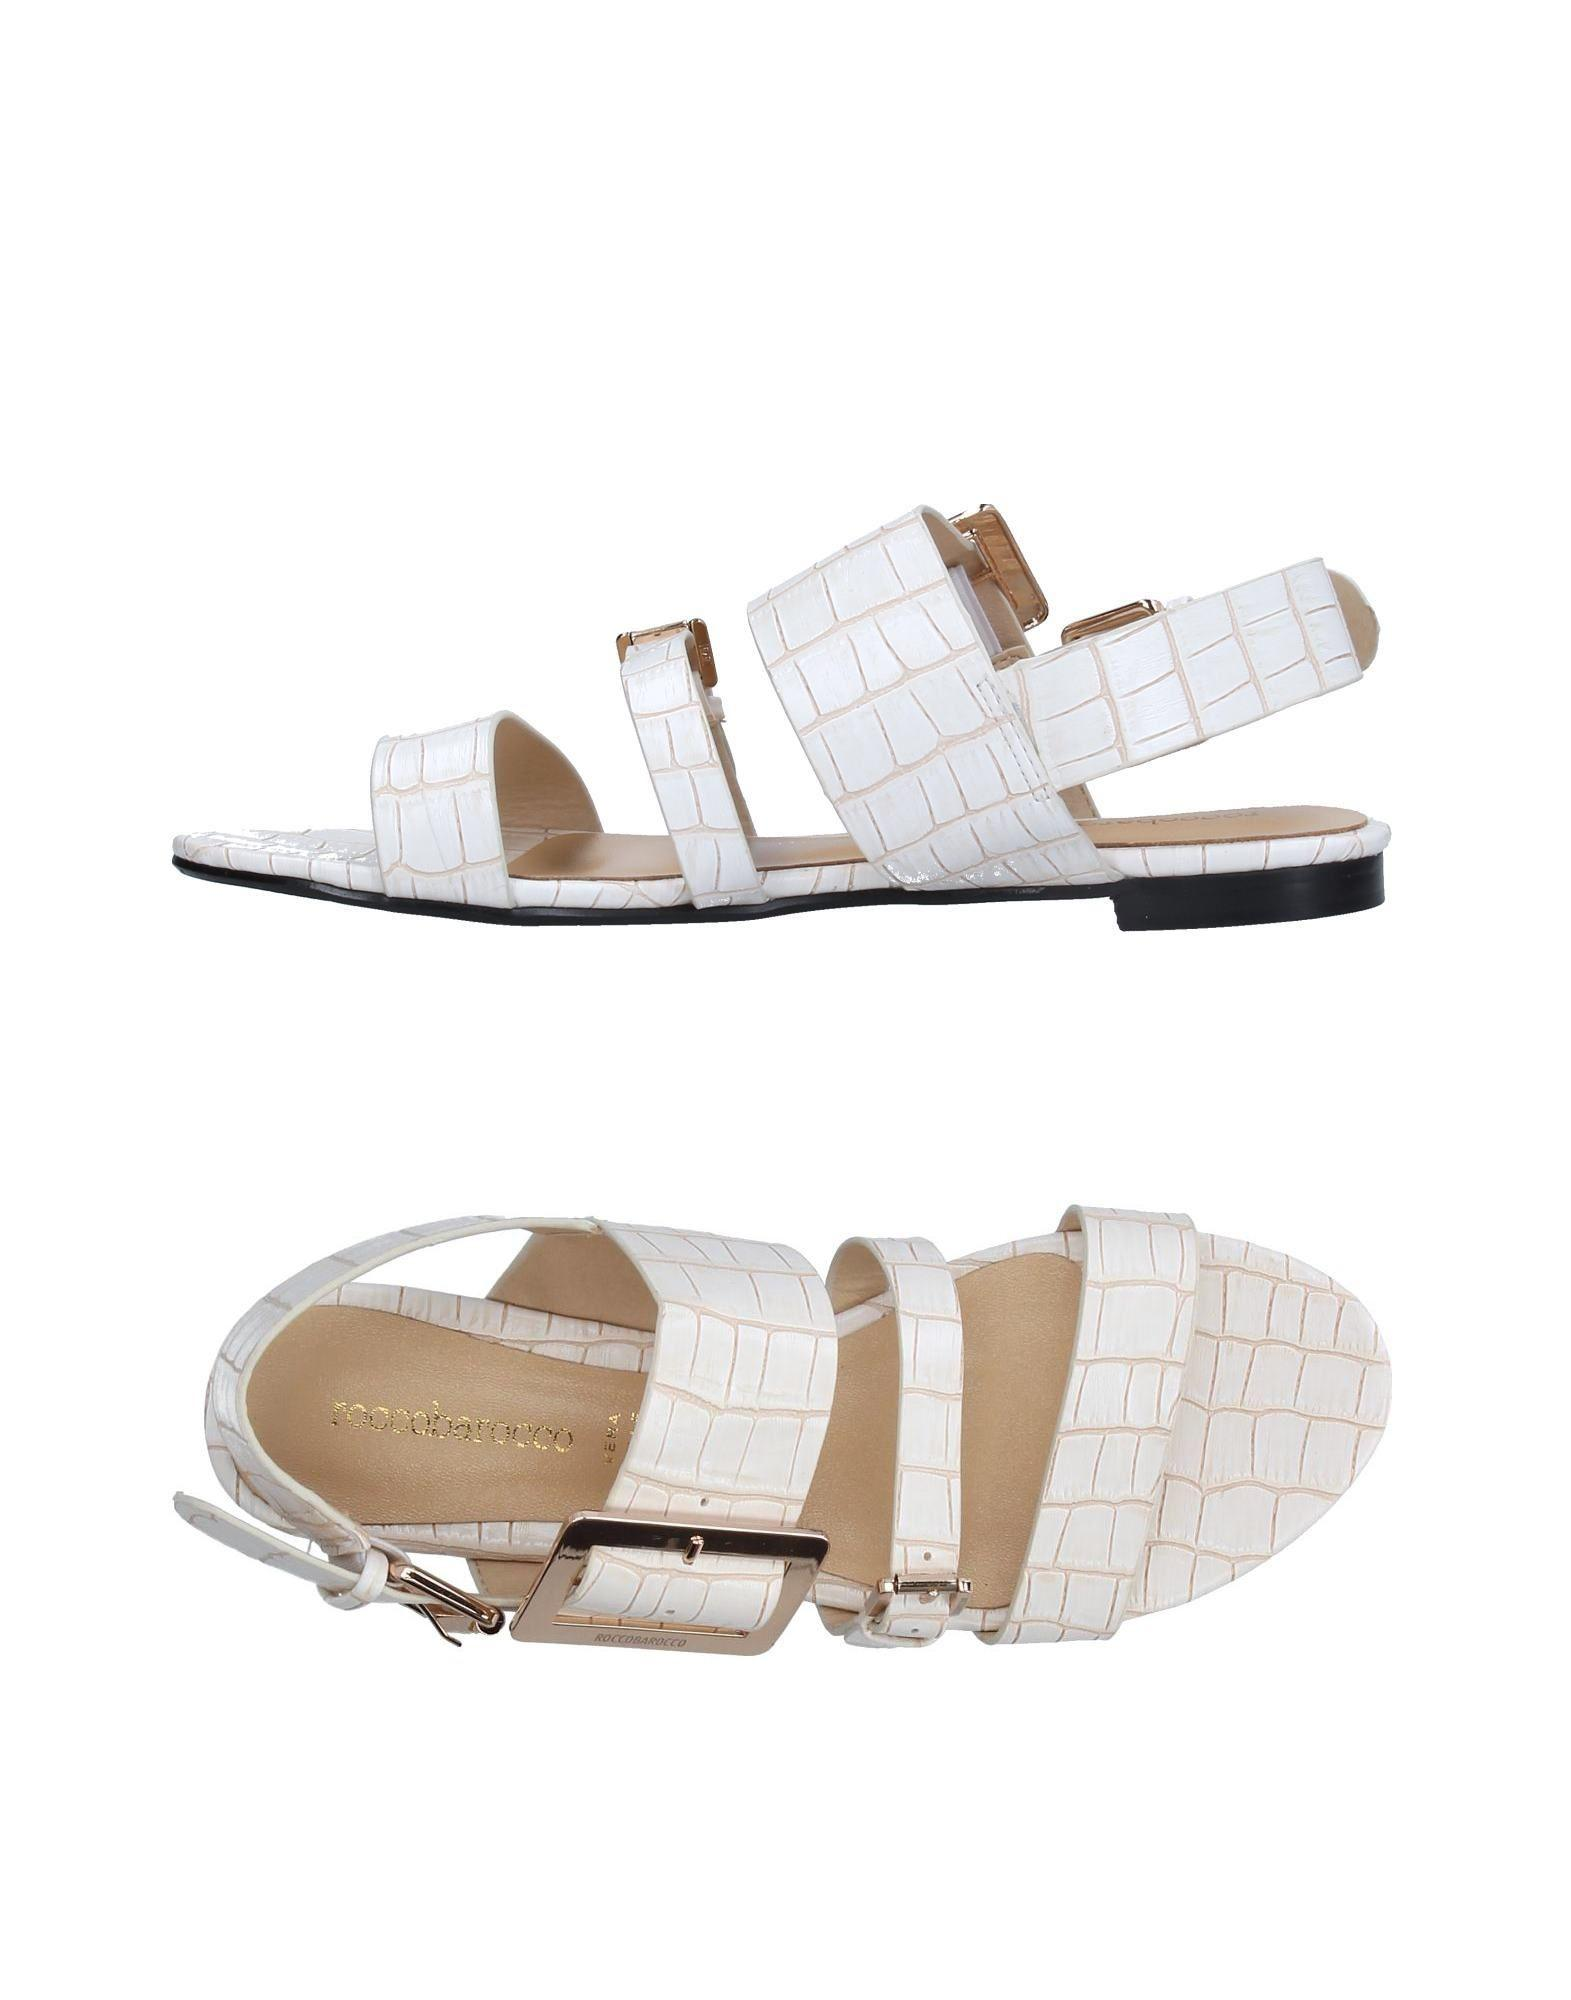 FOOTWEAR - Toe post sandals Roccobarocco f3gRxq